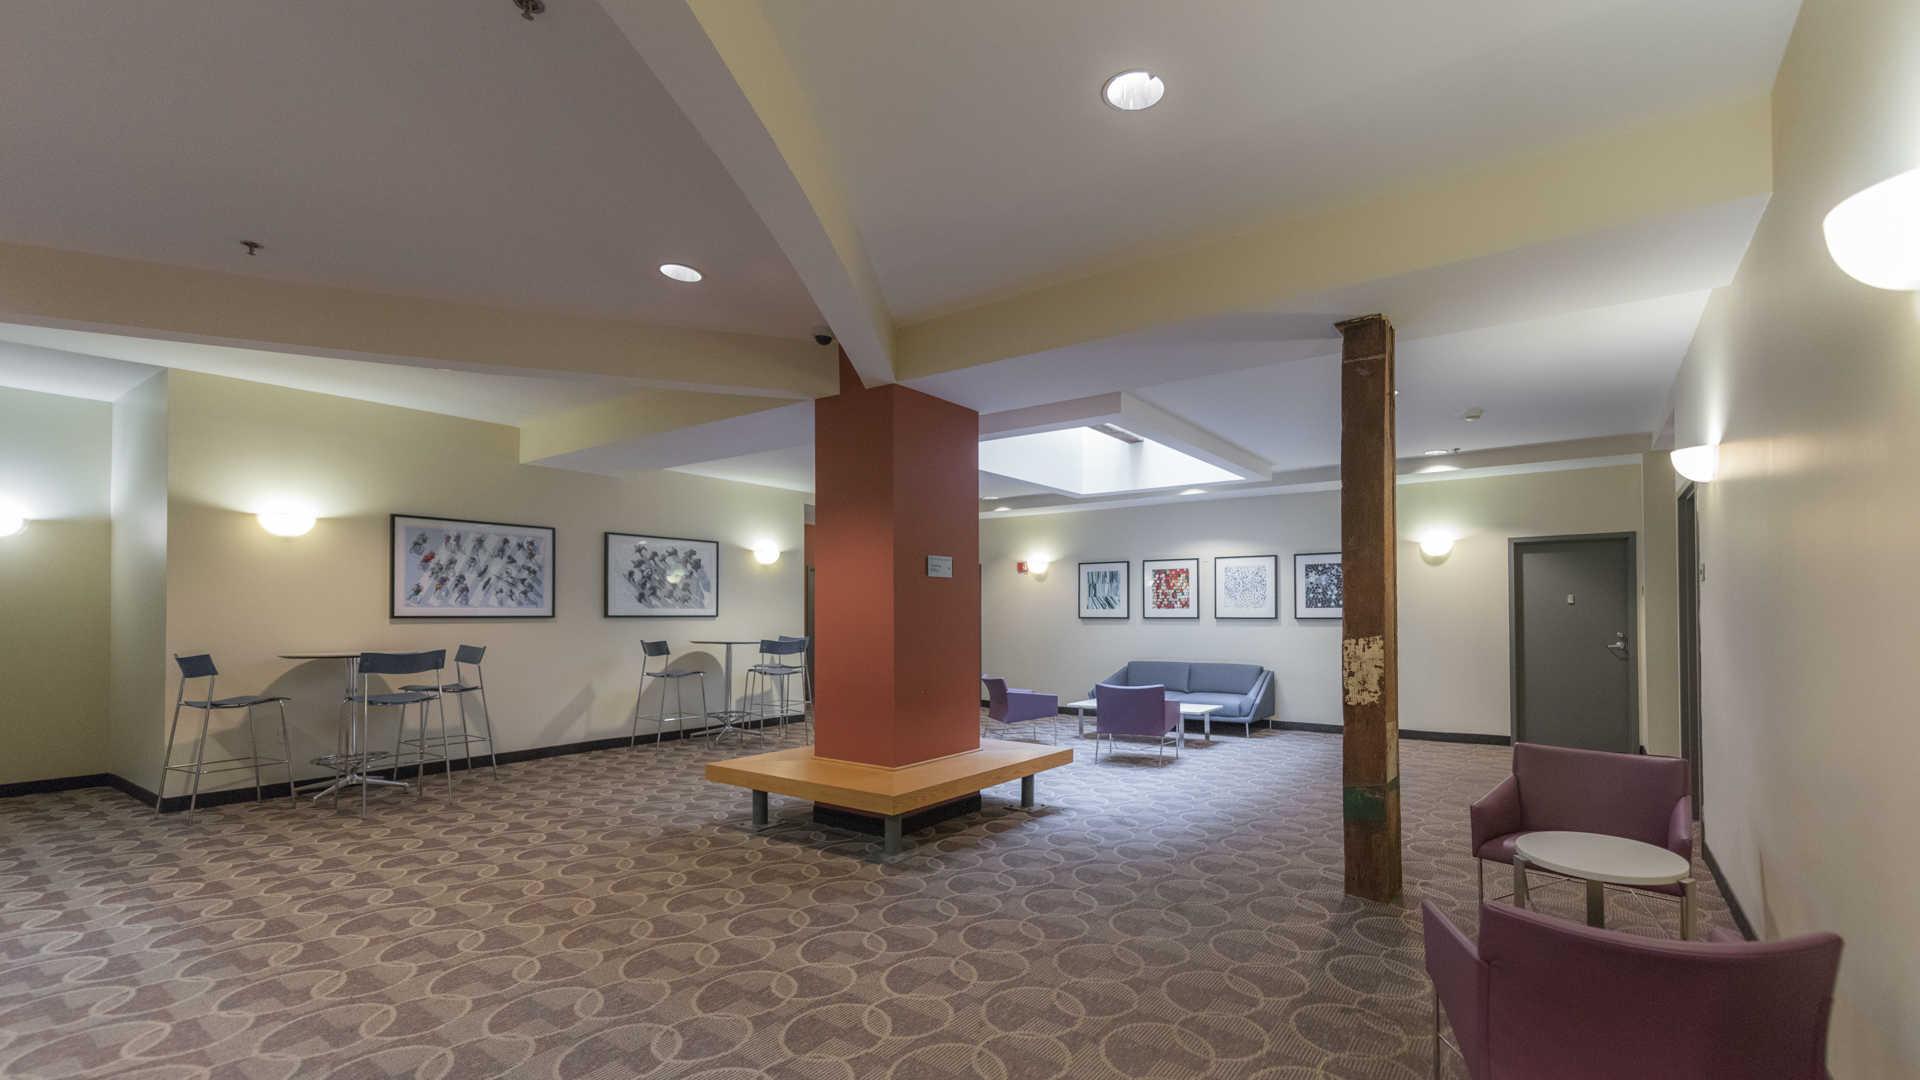 Lofts at kendall square apartments lounge